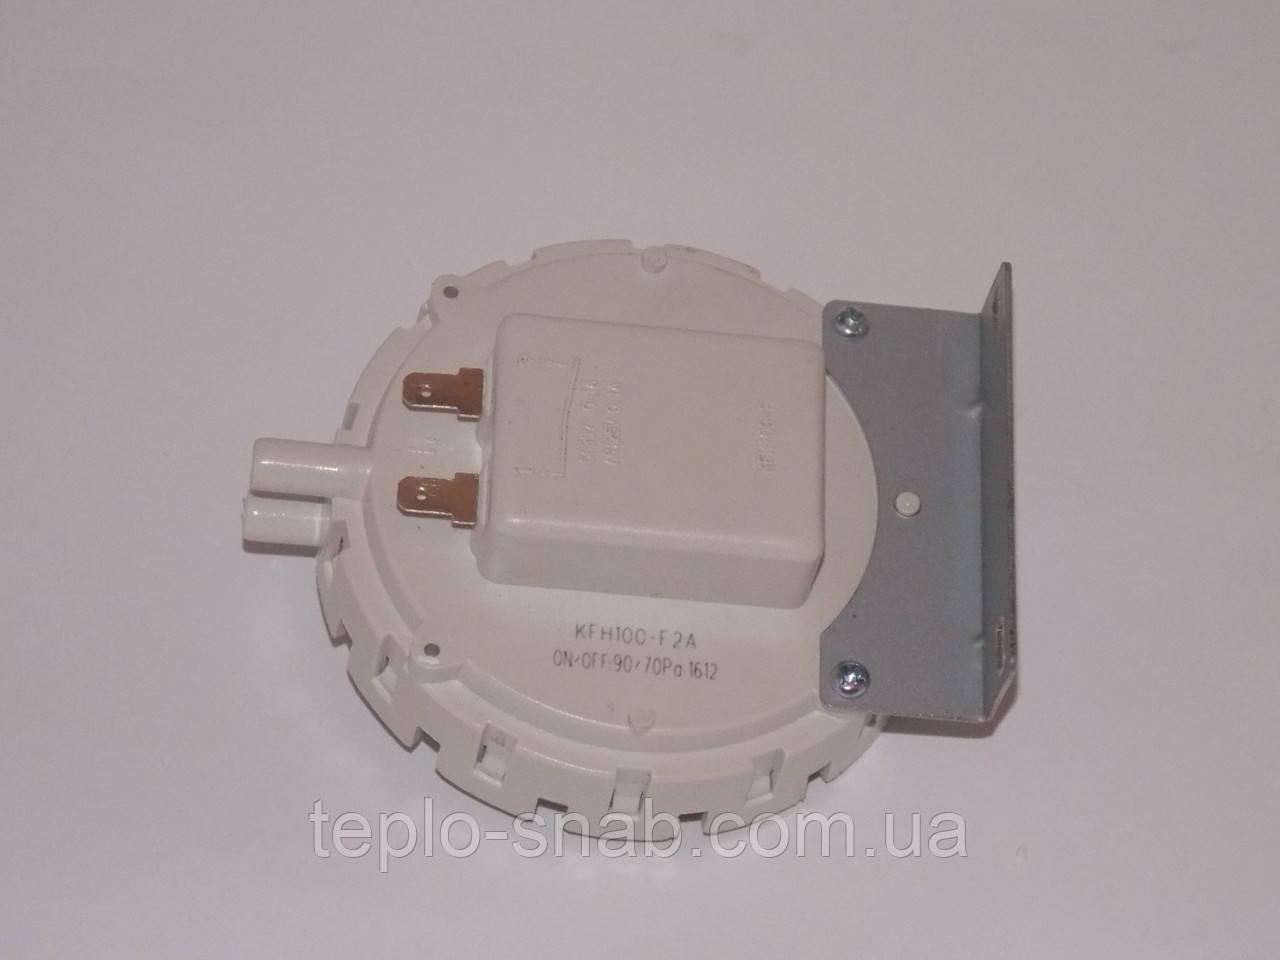 Датчик вентилятора 90-70 Ра (Китай)